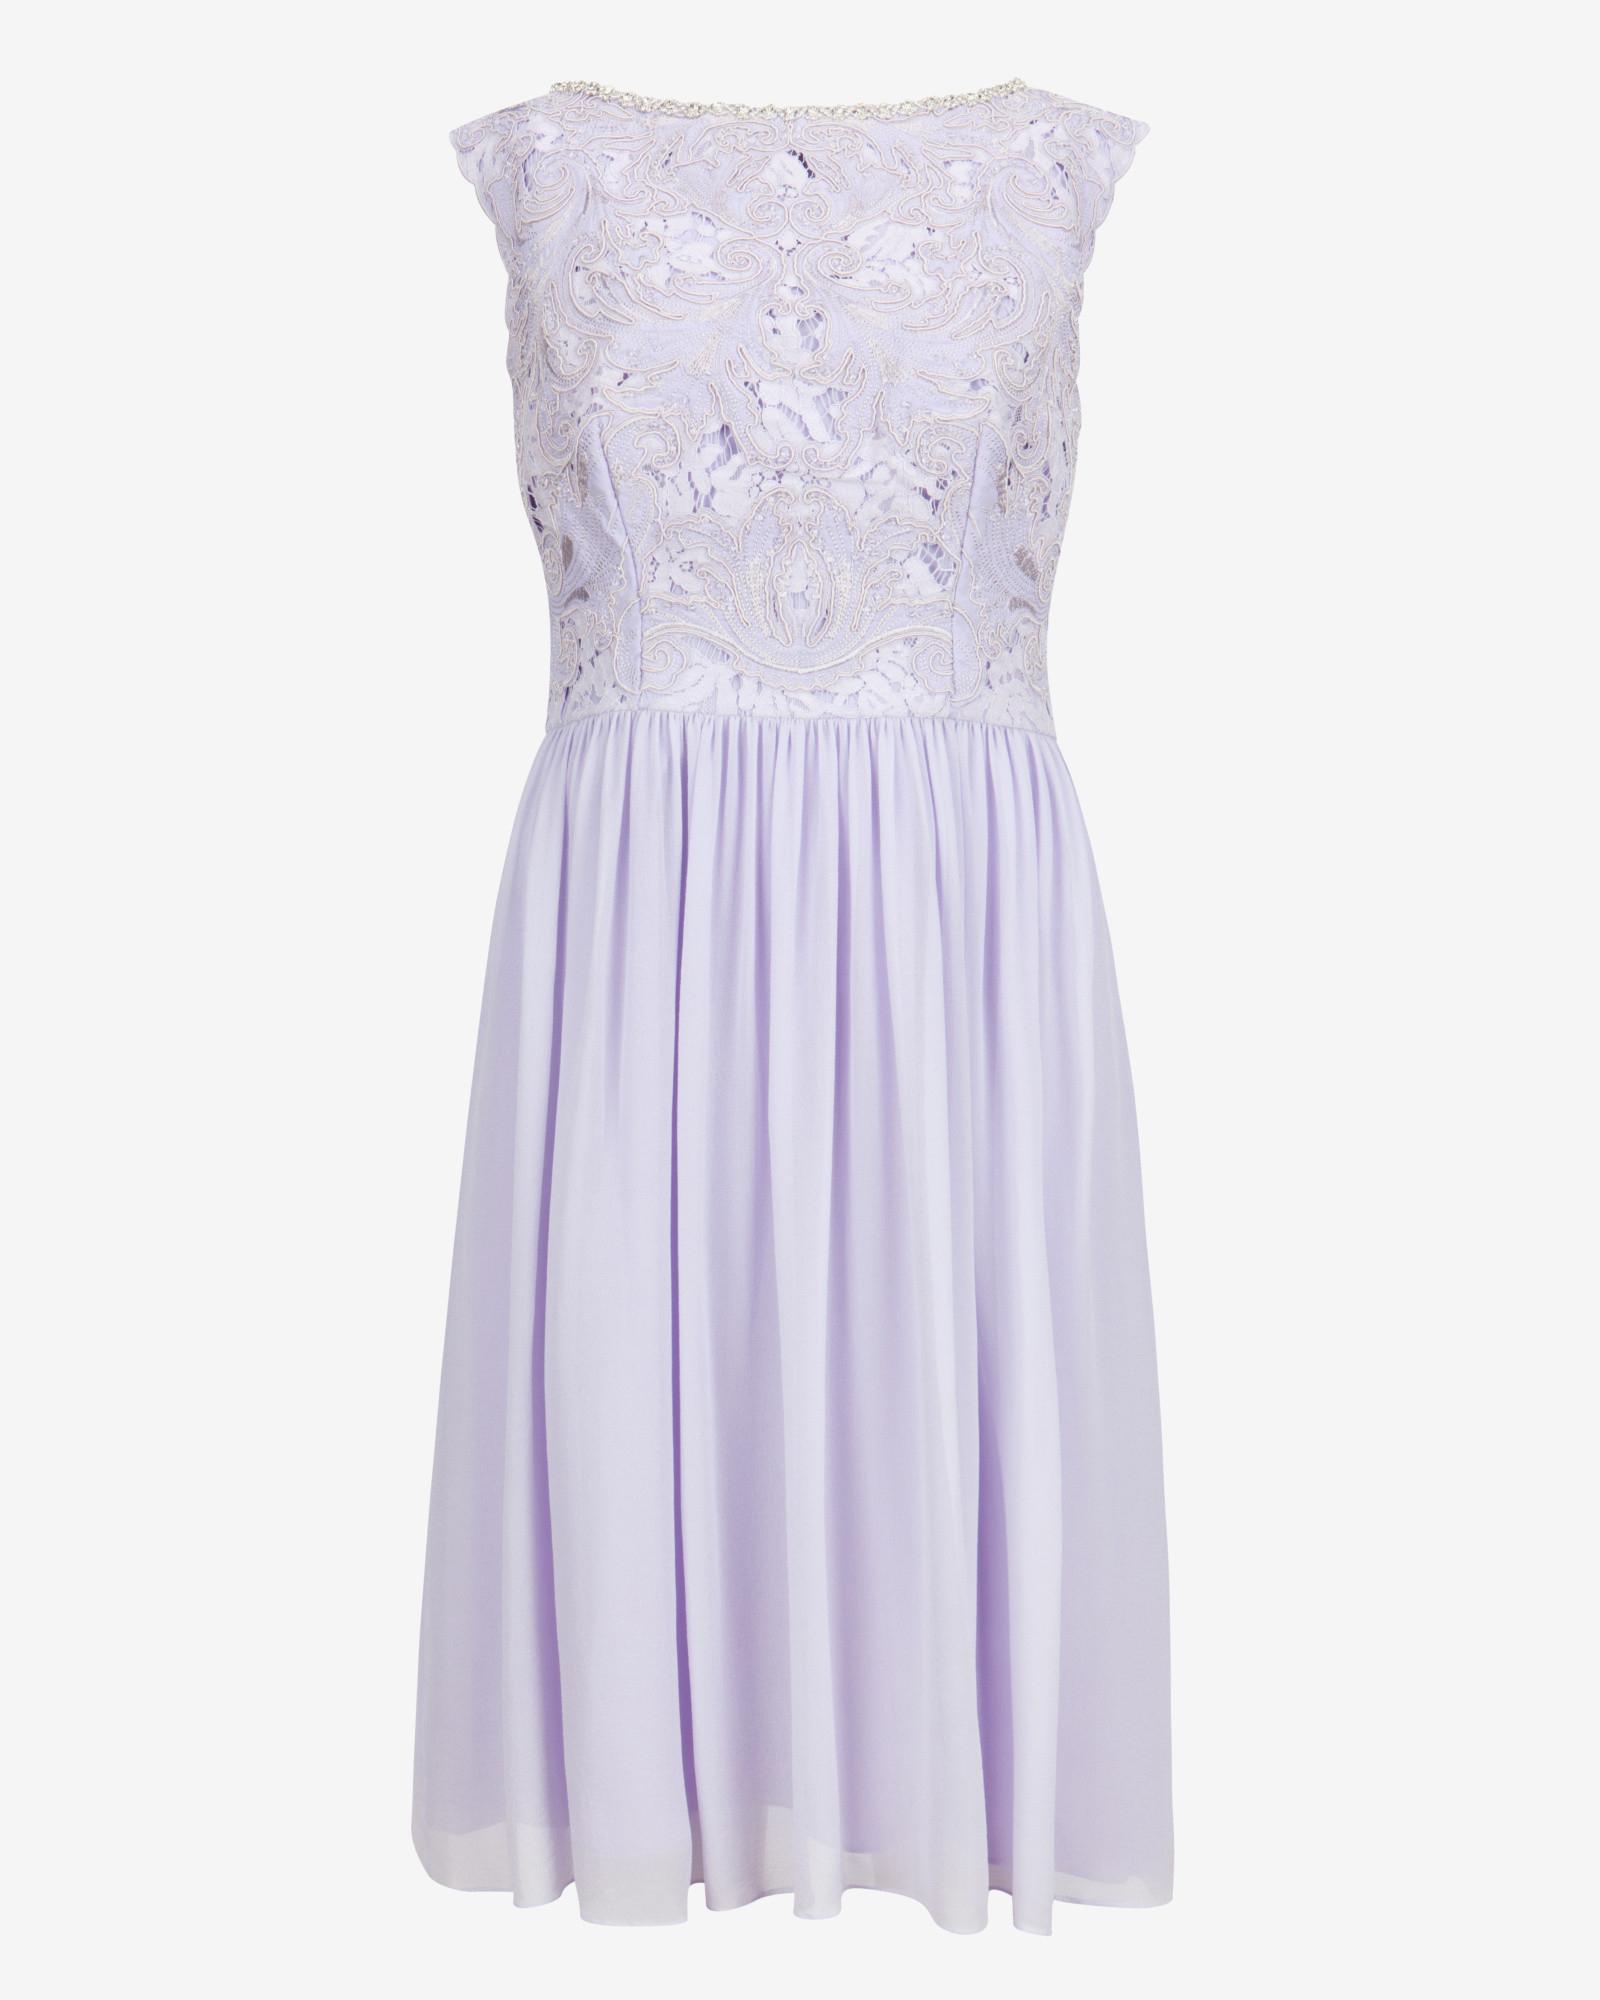 a90df494d Ted baker embellished lace bodice dress in purple lyst jpg 1600x2000 Ted  baker lavender dress